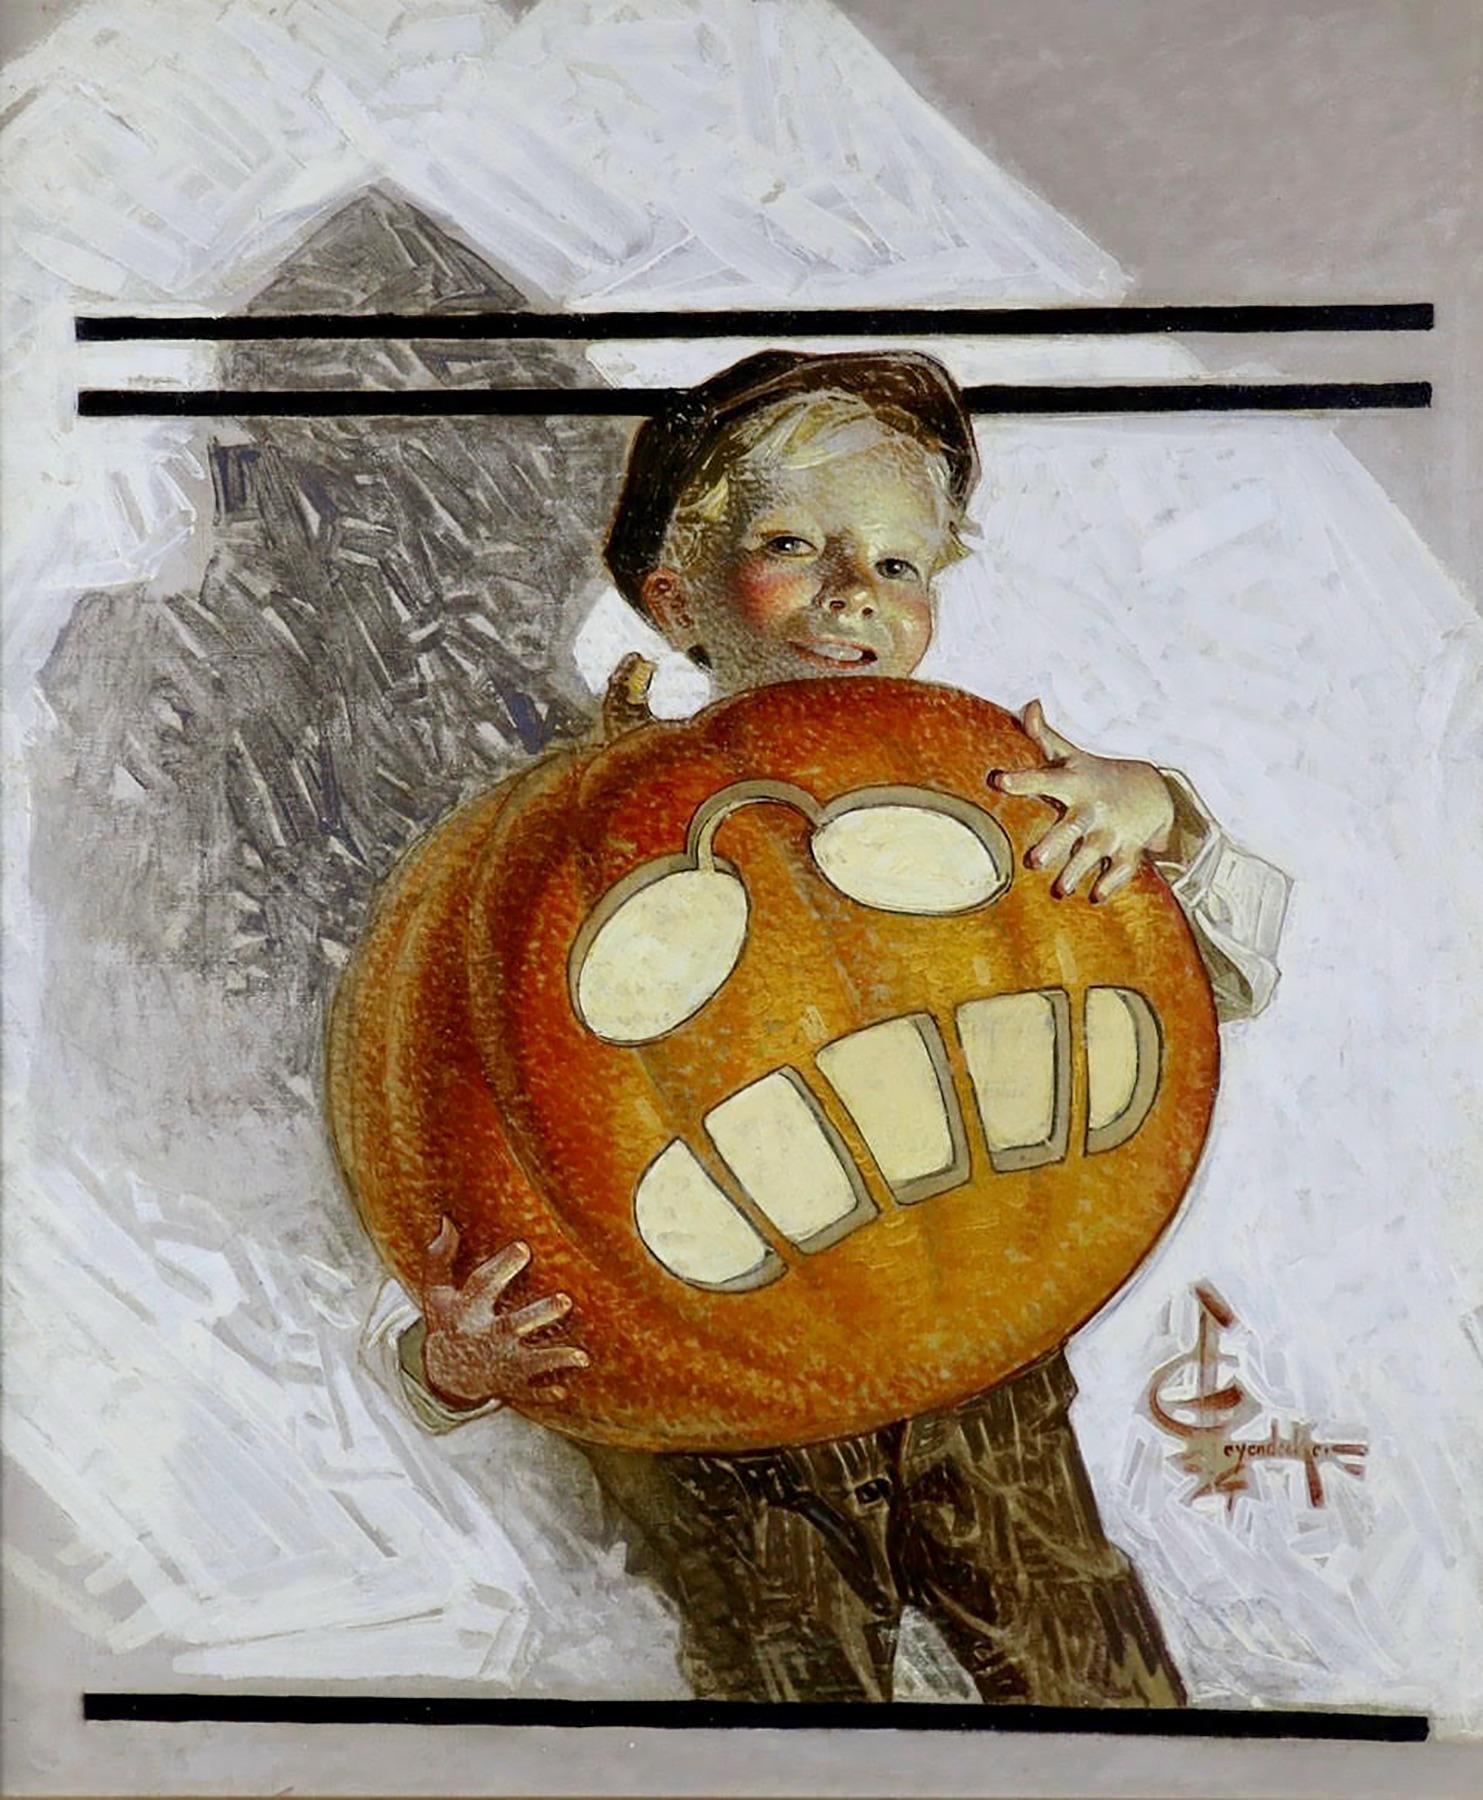 Boy Holding Pumpkin Carving of Teddy Roosevelt